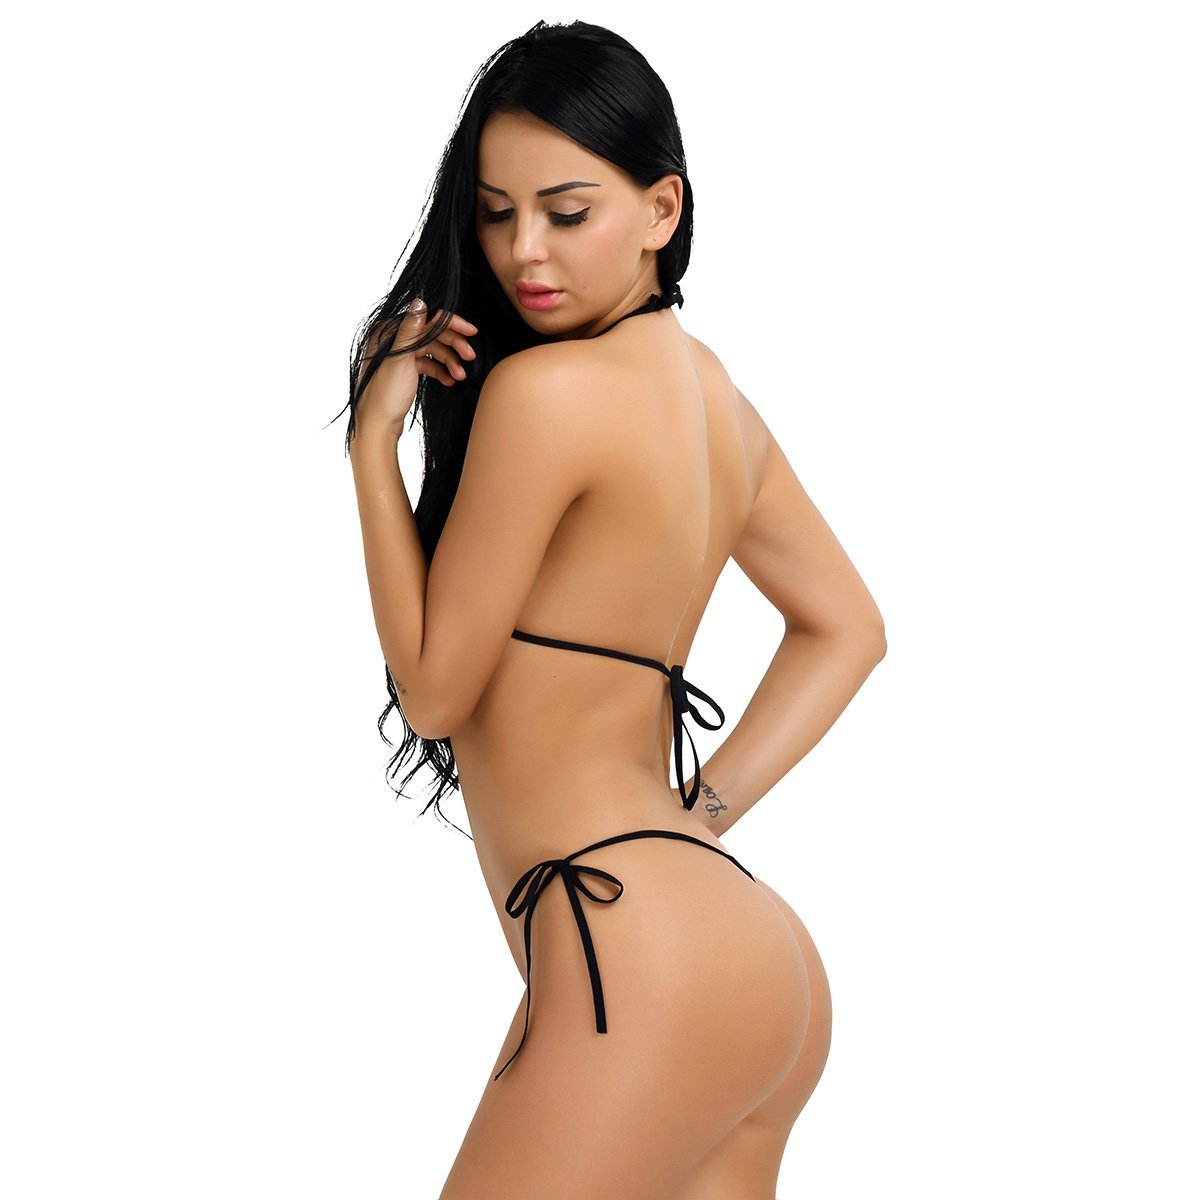 789264574211 Amazon.com  FEESHOW Women s Mini Bra Bikini 2pc Micro G-String Thong  Swimwear Beige One Size  Clothing